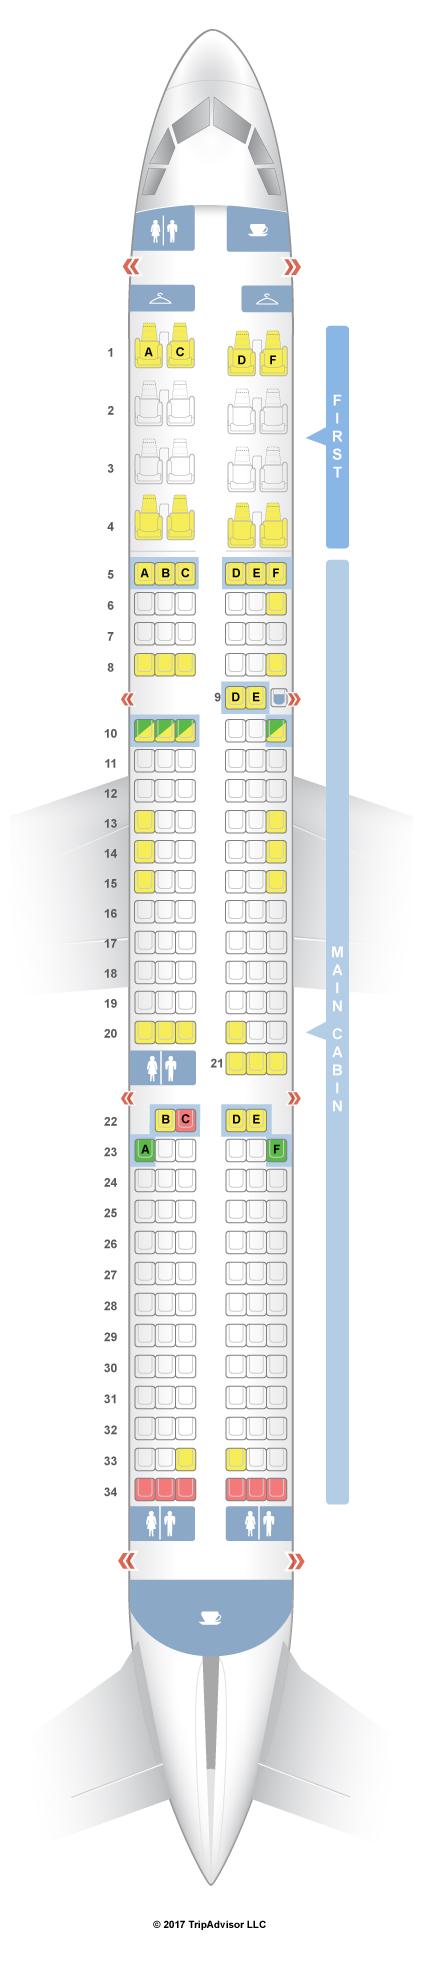 SeatGuru Seat Map American Airlines Airbus A V - Us airways seating map